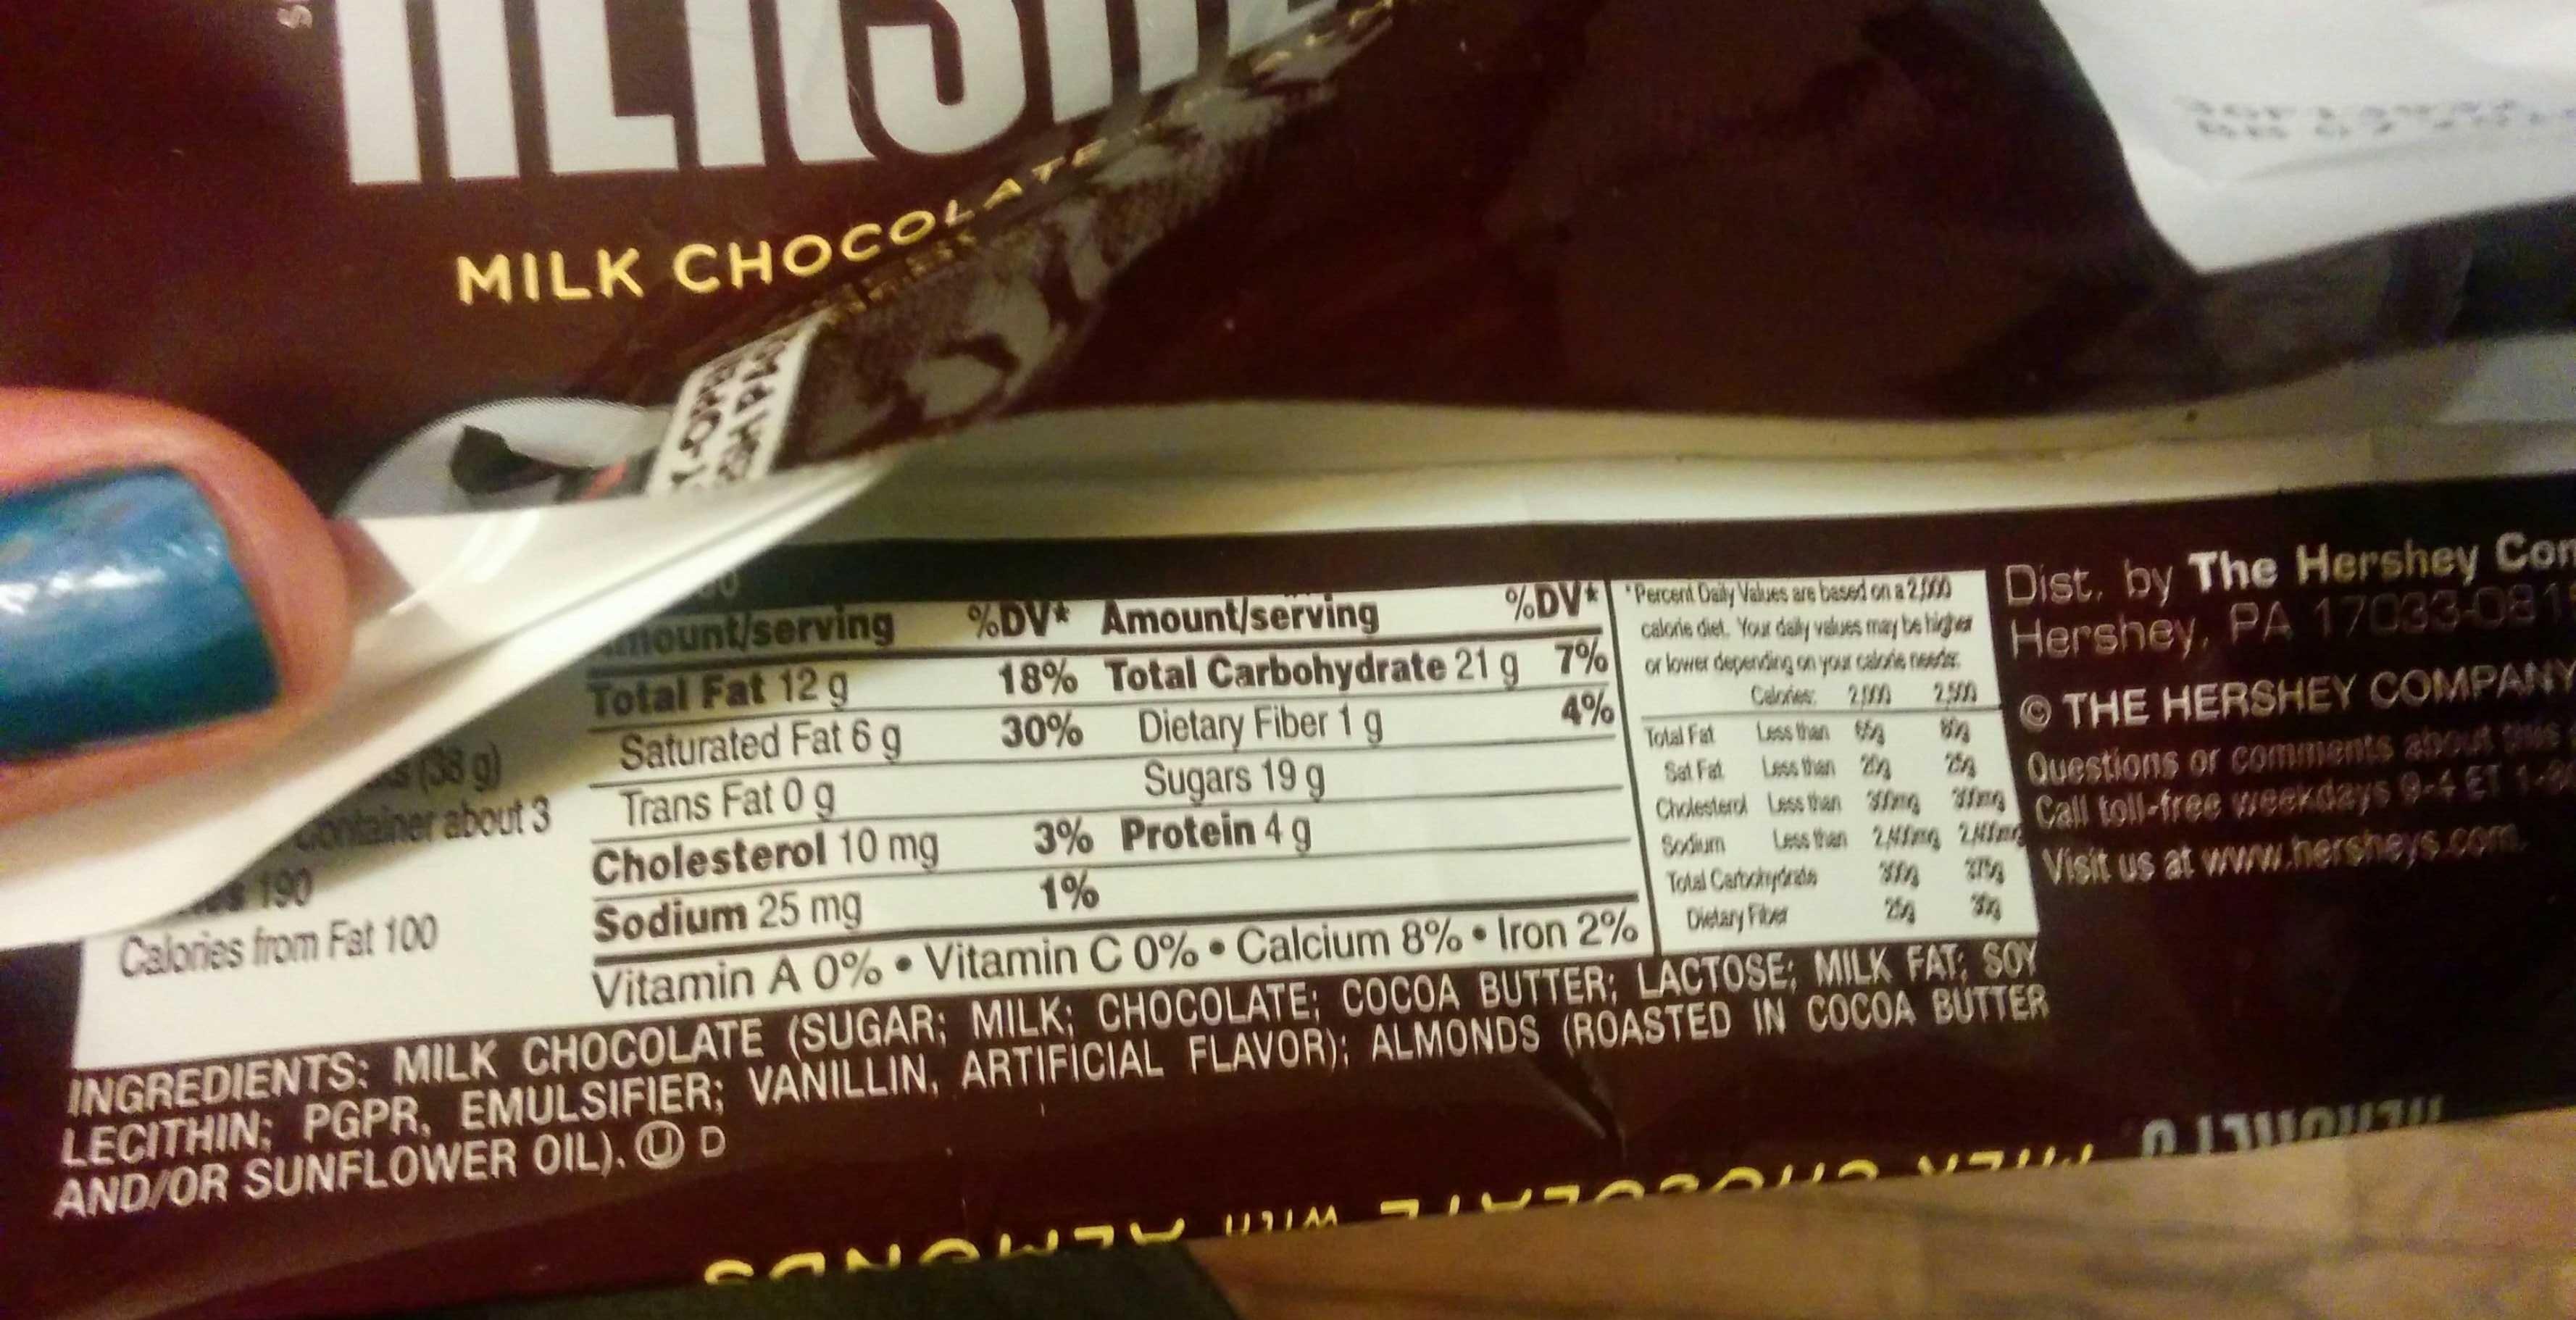 Hershey's Milk Chocolate With Almonds - 4.25 Oz - Product